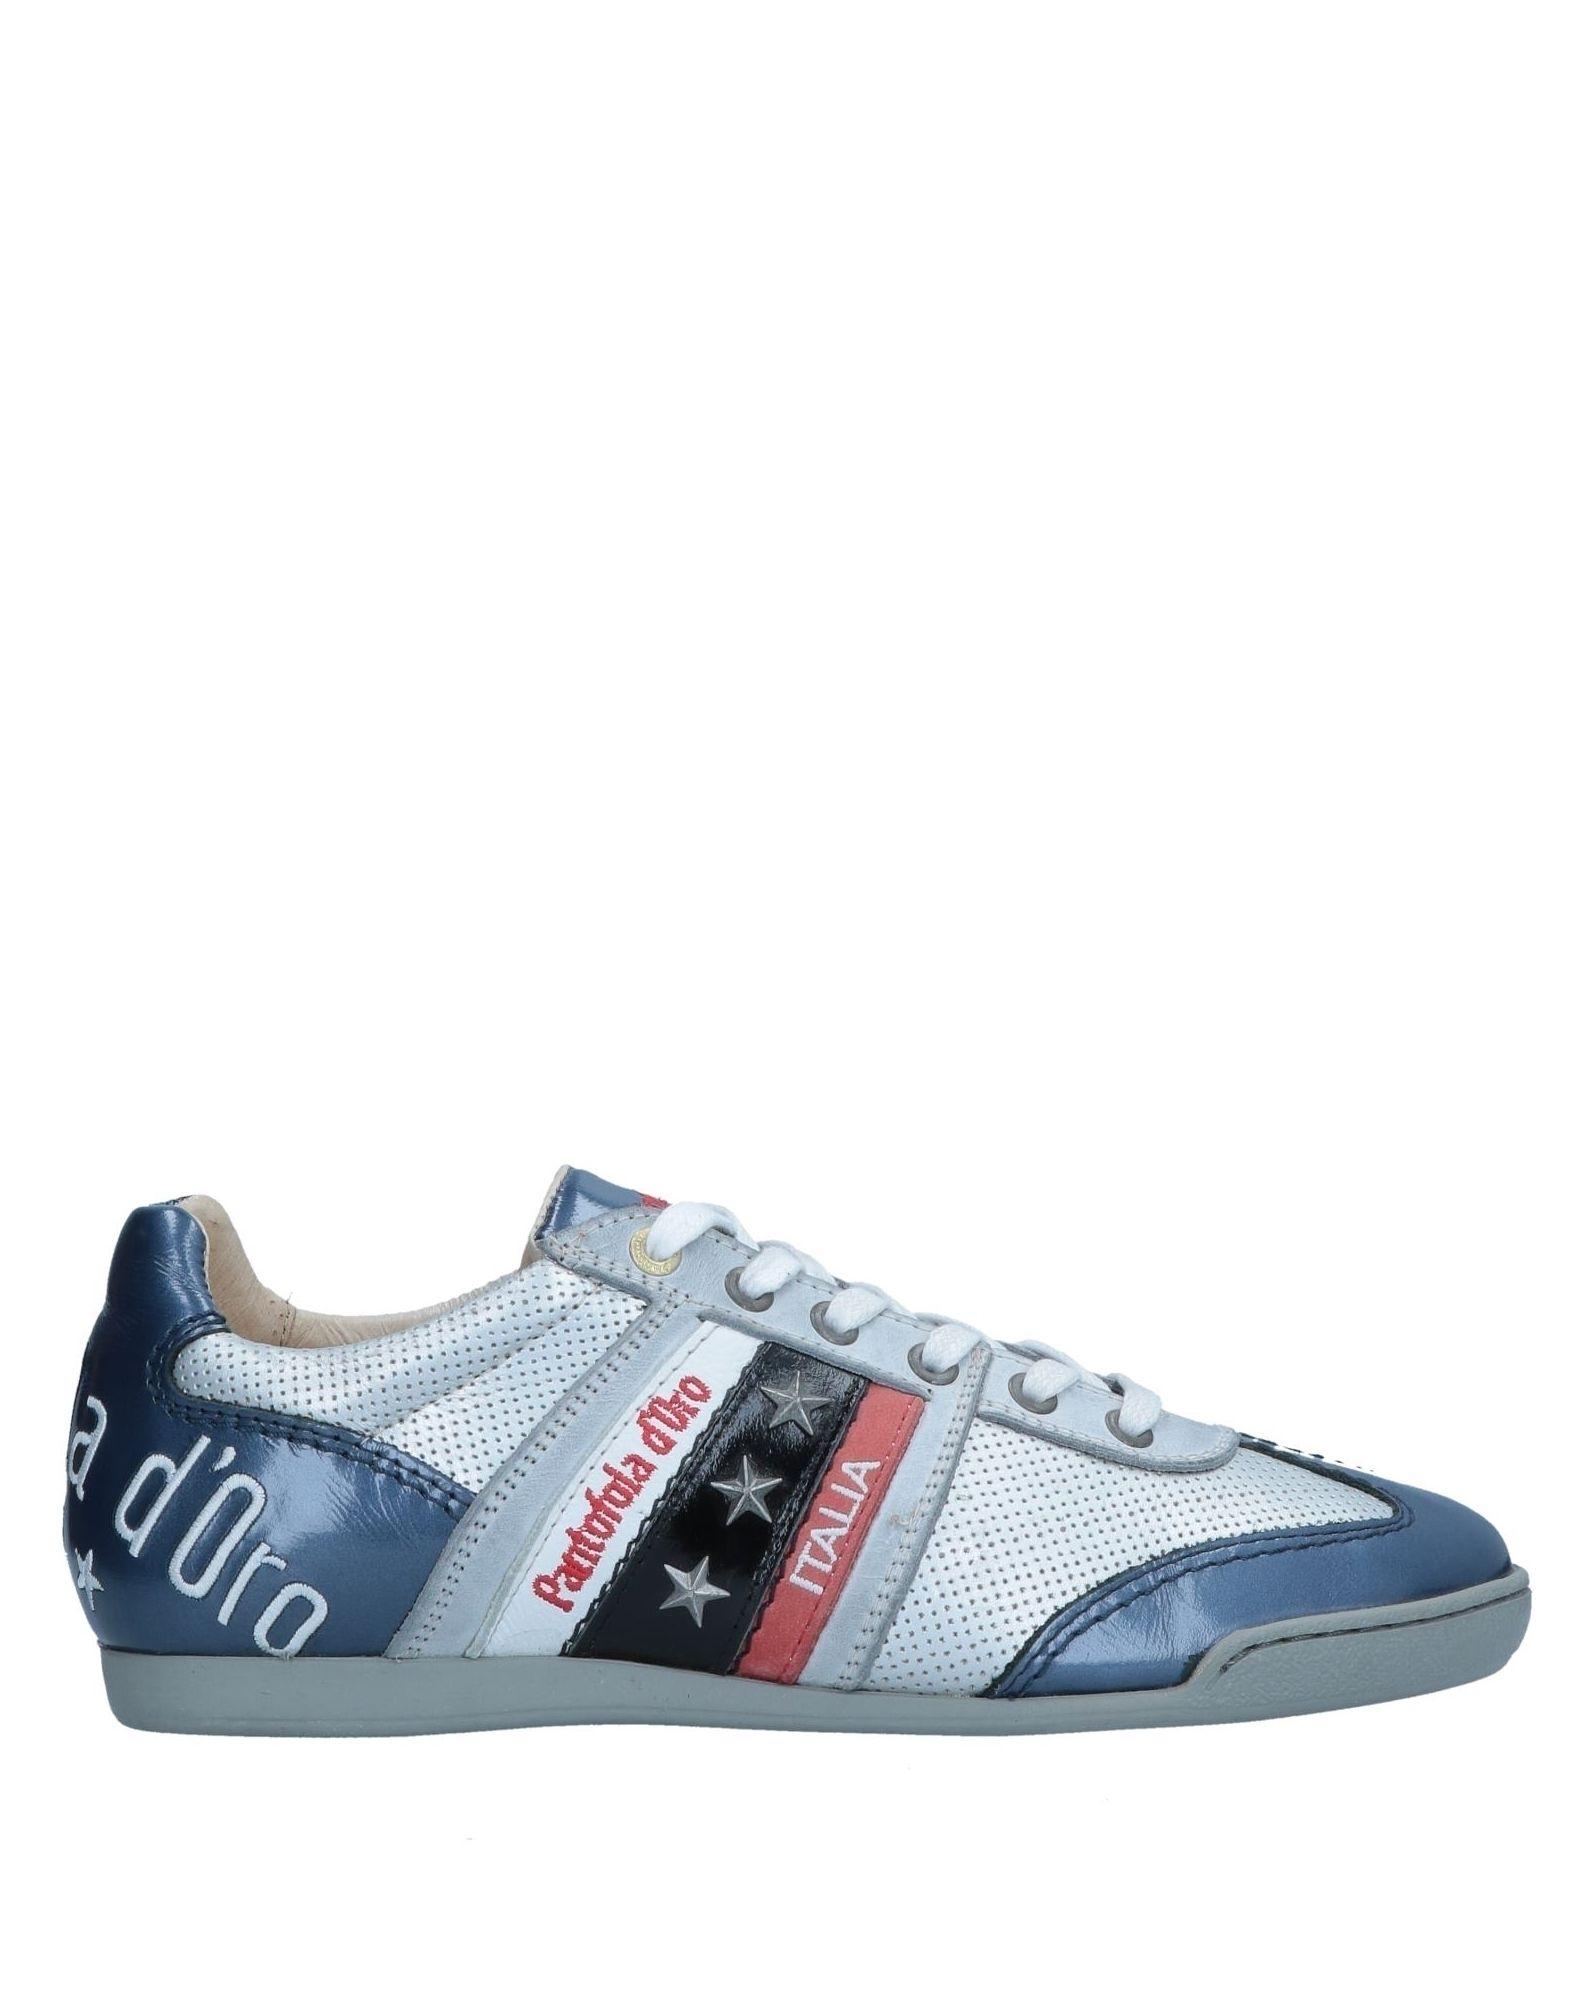 Pantofola D'oro Sneakers Herren beliebte  11545395KG Gute Qualität beliebte Herren Schuhe c12bfb